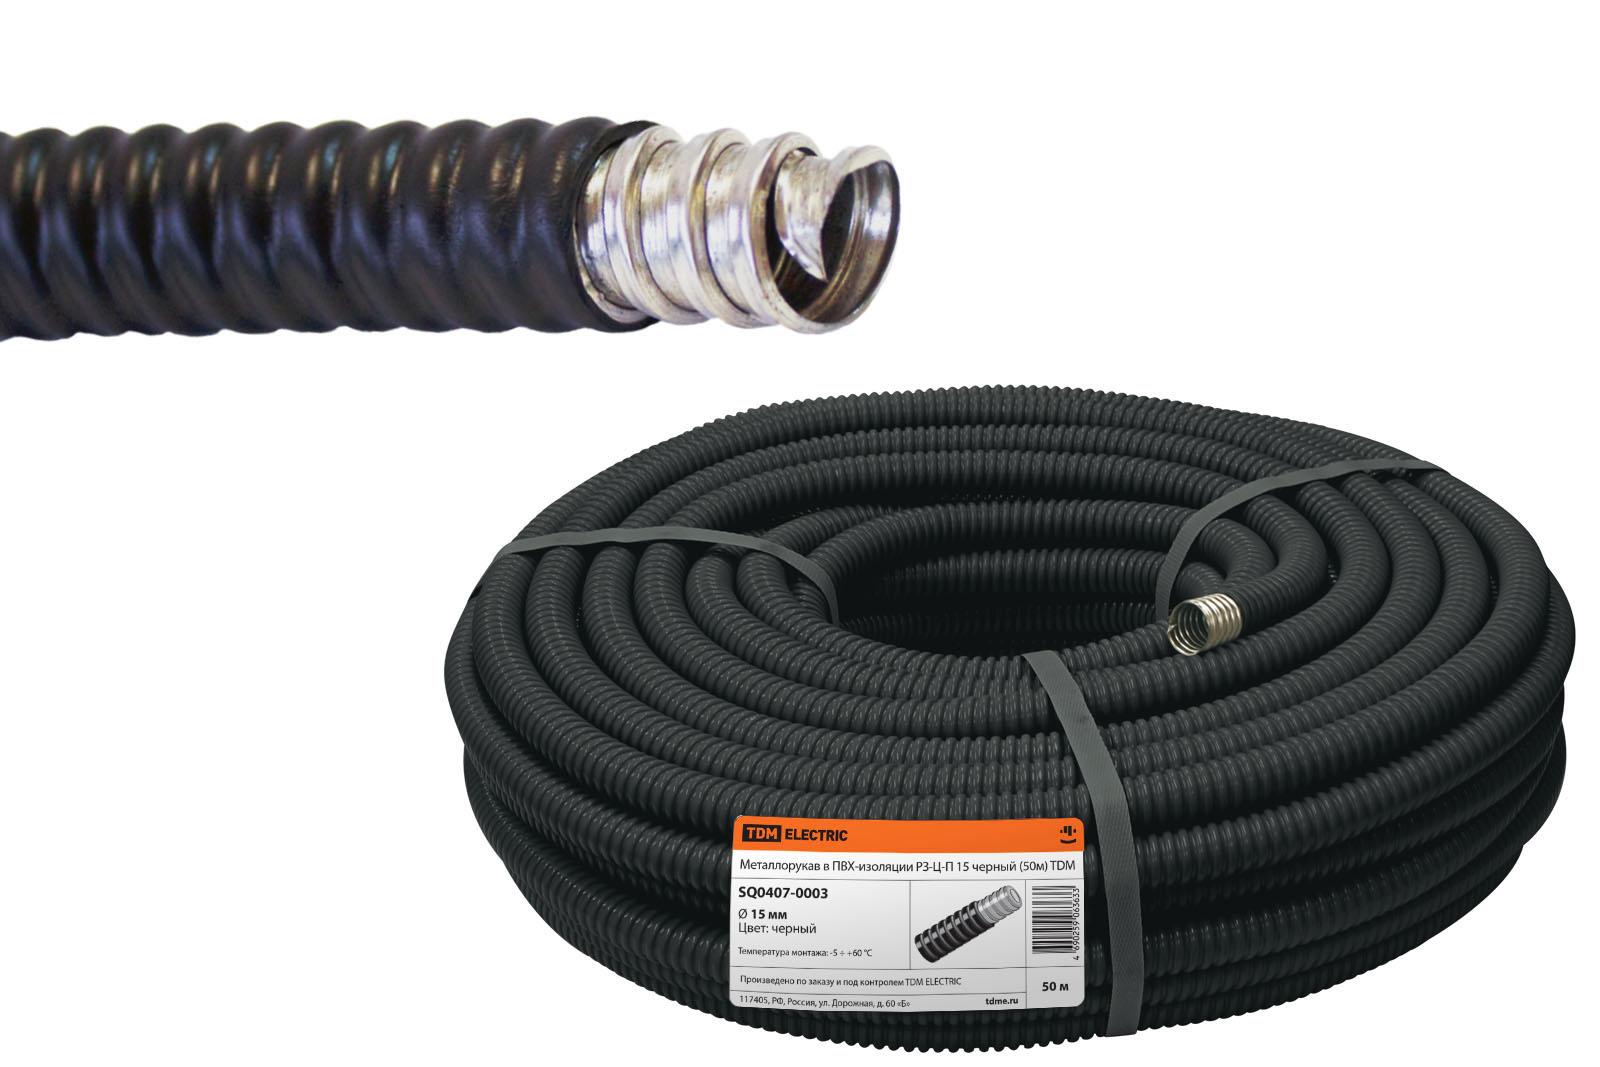 Металлорукав в ПВХ-изоляции РЗ-Ц-П 15 черный (50м) TDM SQ0407-0003 TDM Electric